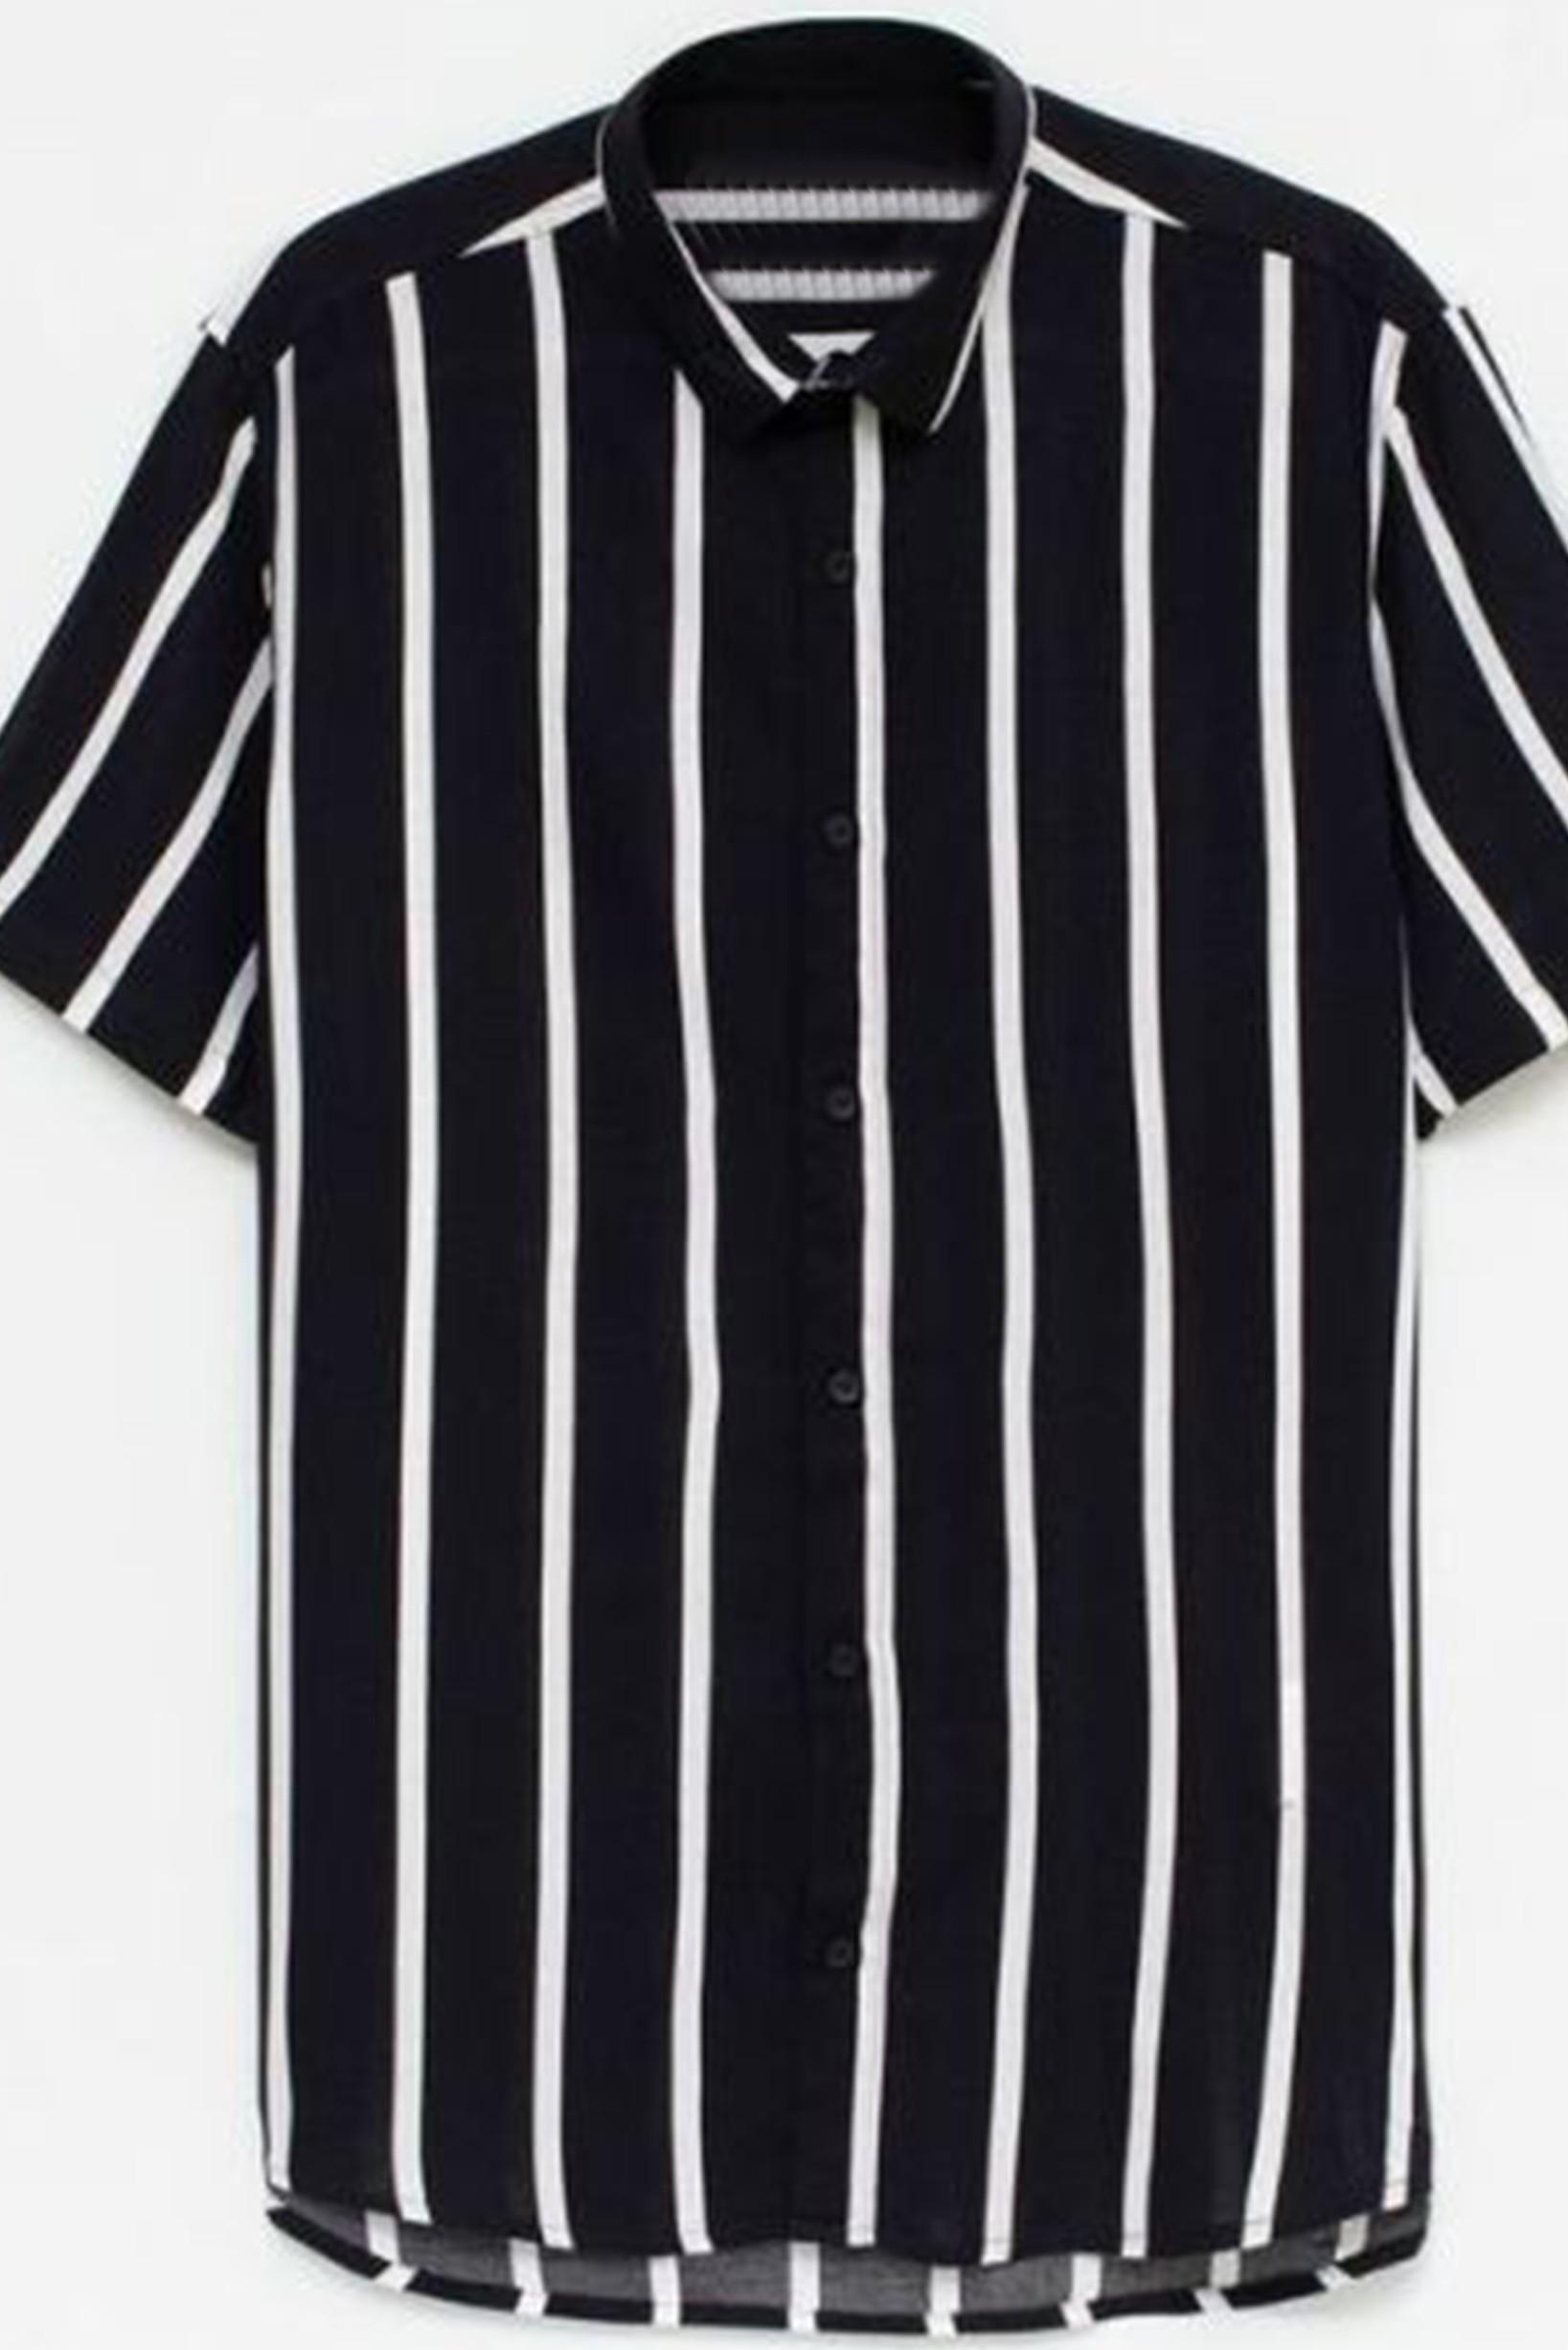 Cool black stripe men shirt